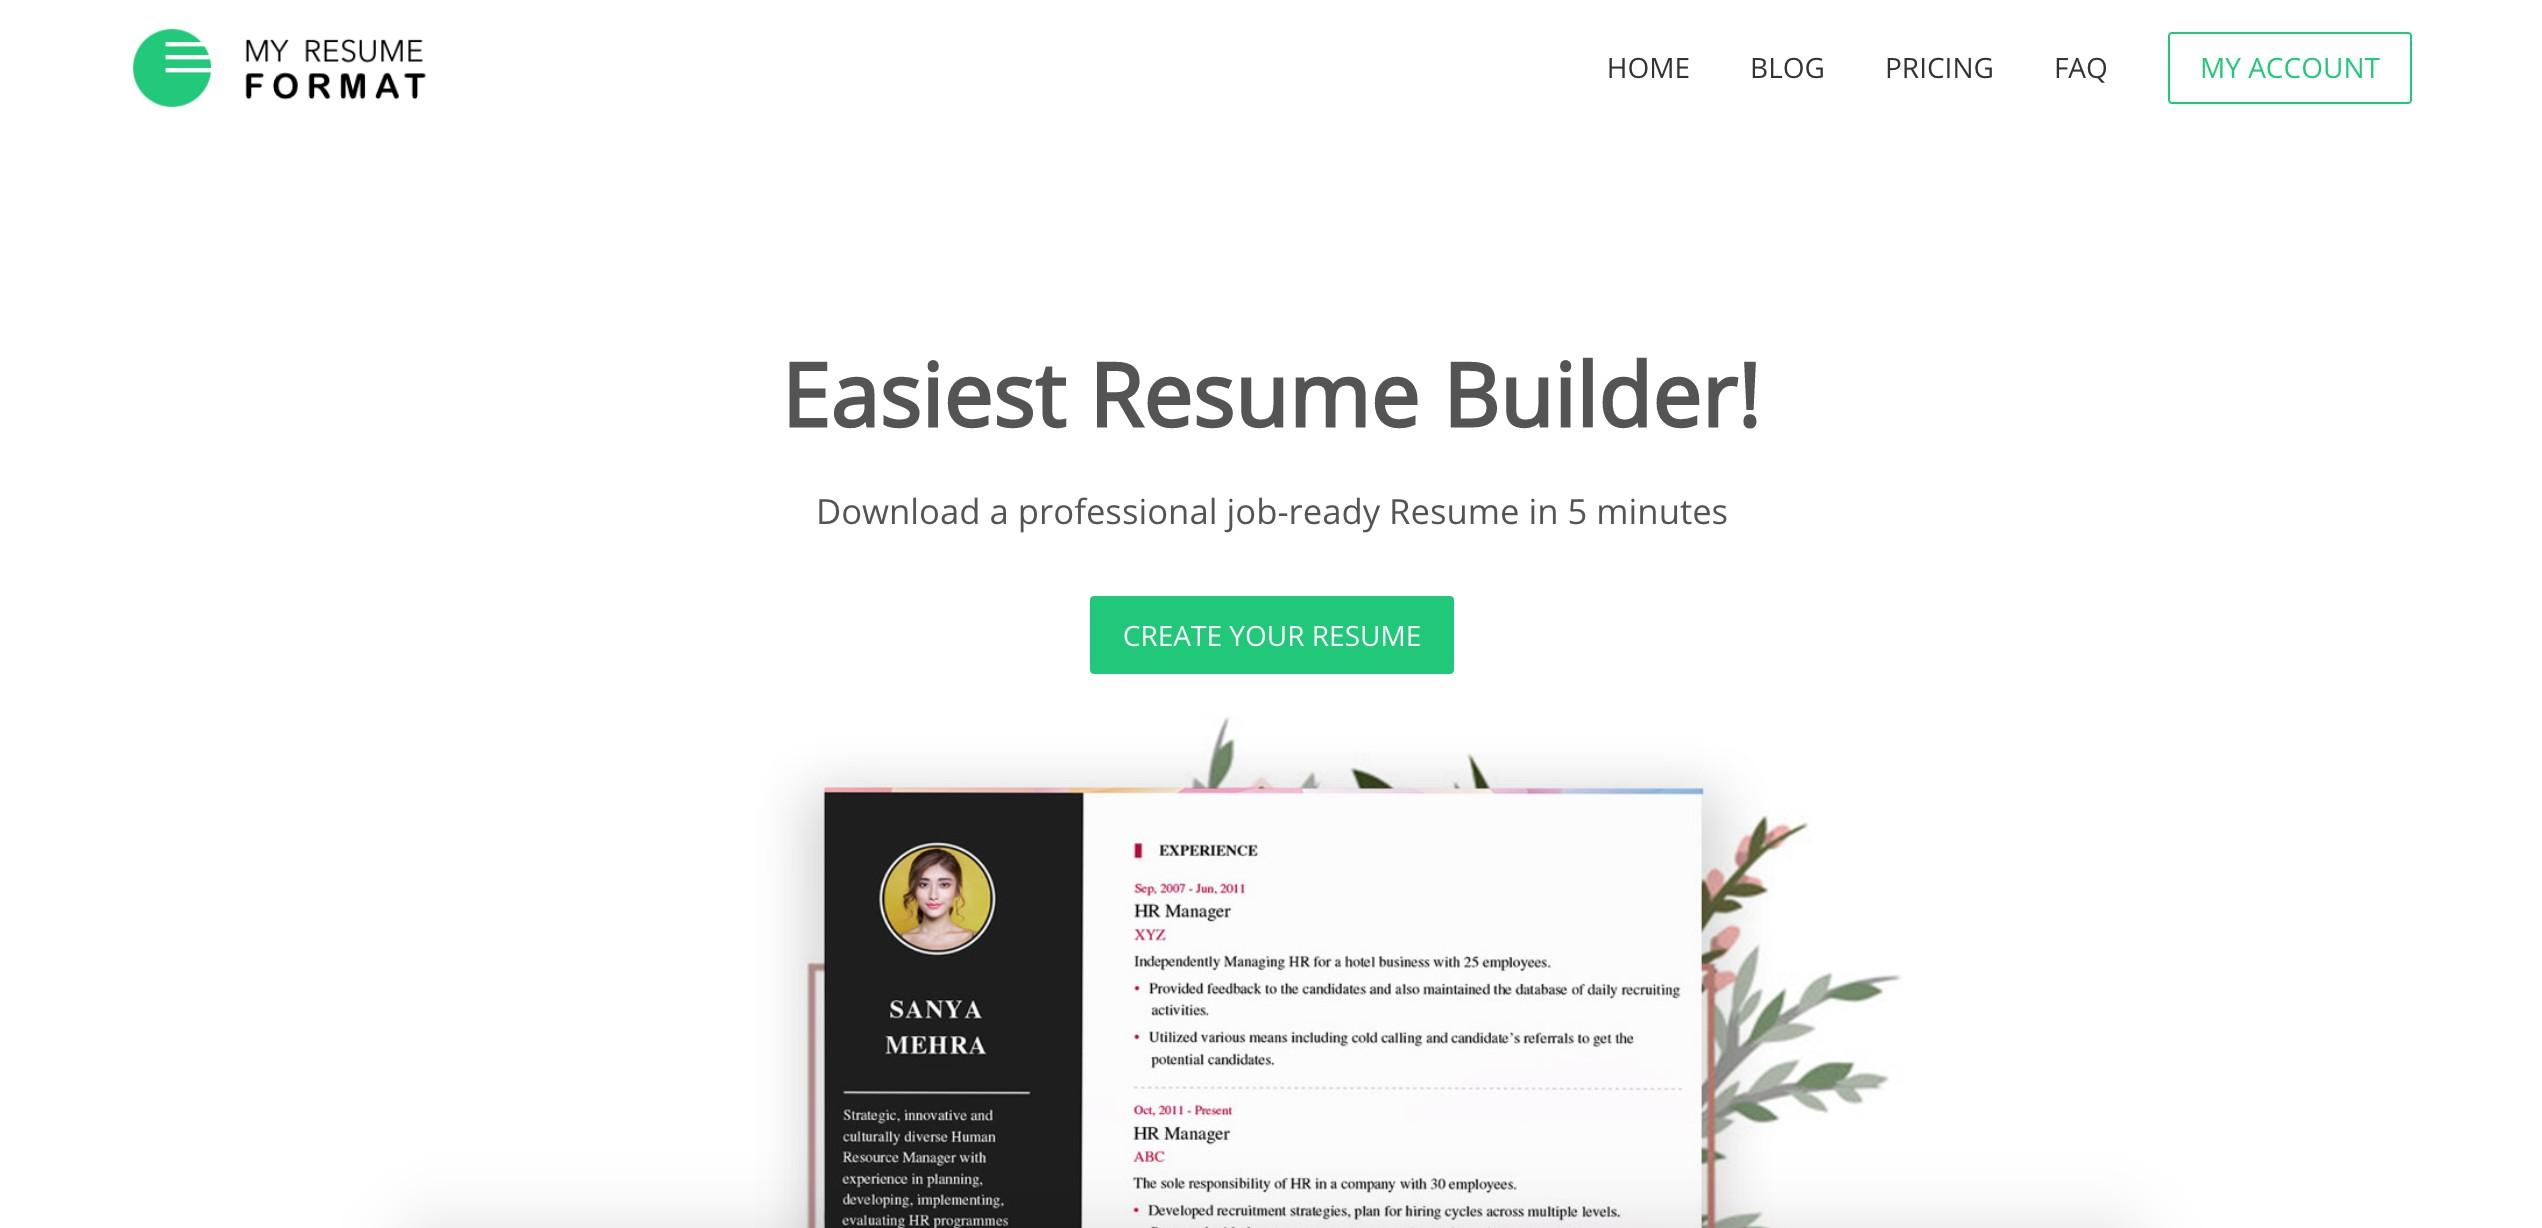 My Resume Format Linkedin